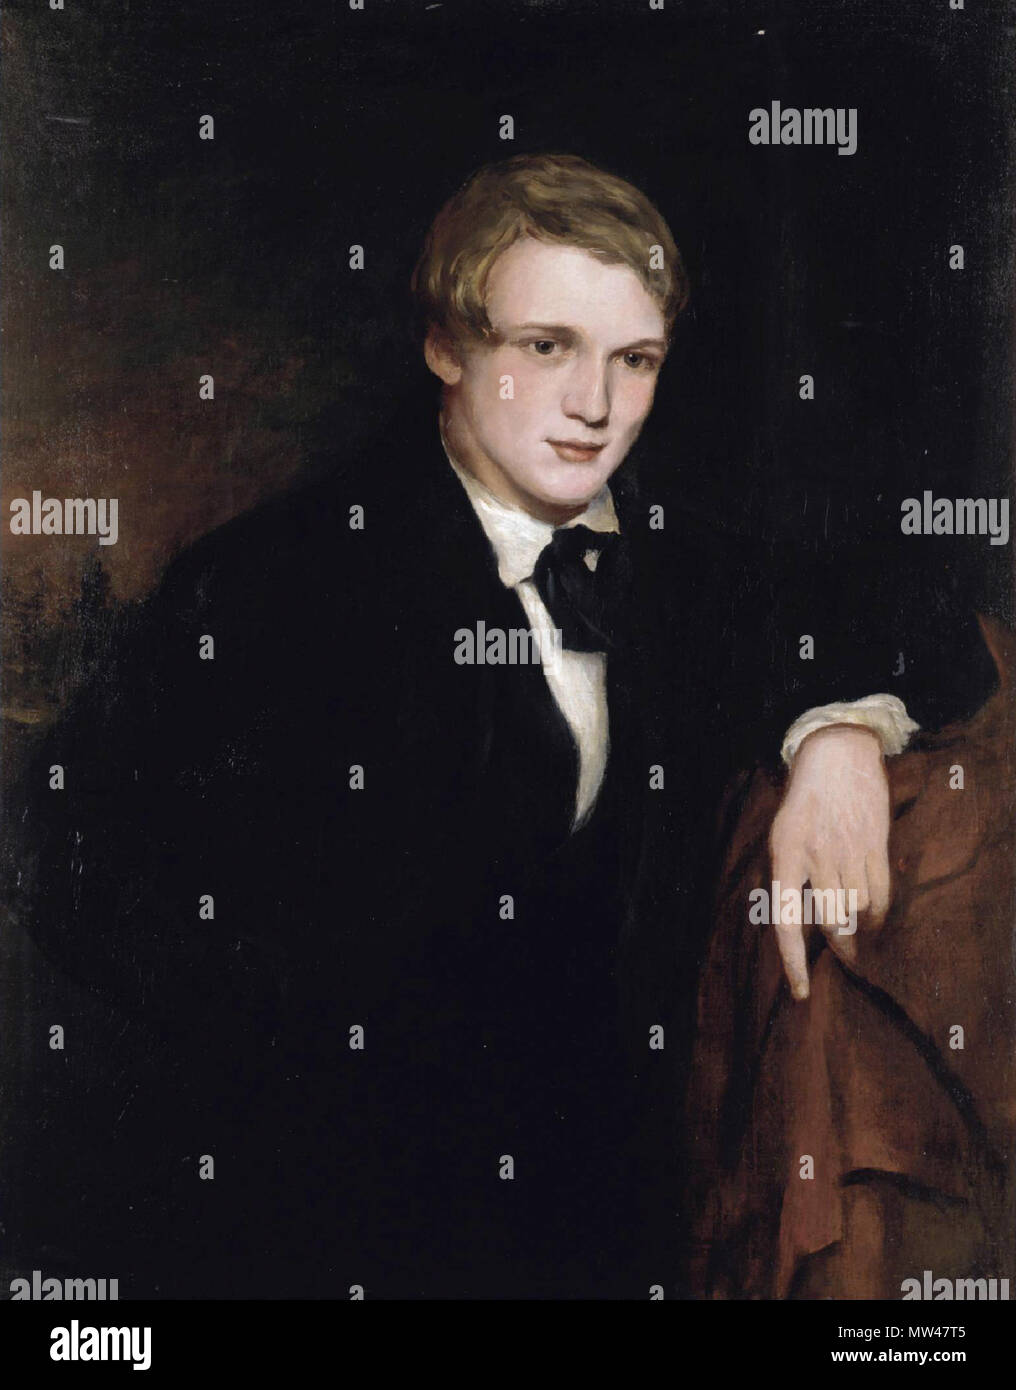 . Inglese: William Powell Frith olio su tela 91,5 x 71 cm 1836-1838 . tra 1836 e 1838. attribuita a Douglas Cowper (1817-1839) 649 William Powell Frith, attribuito a Douglas Cowper (1817-1839) Immagini Stock